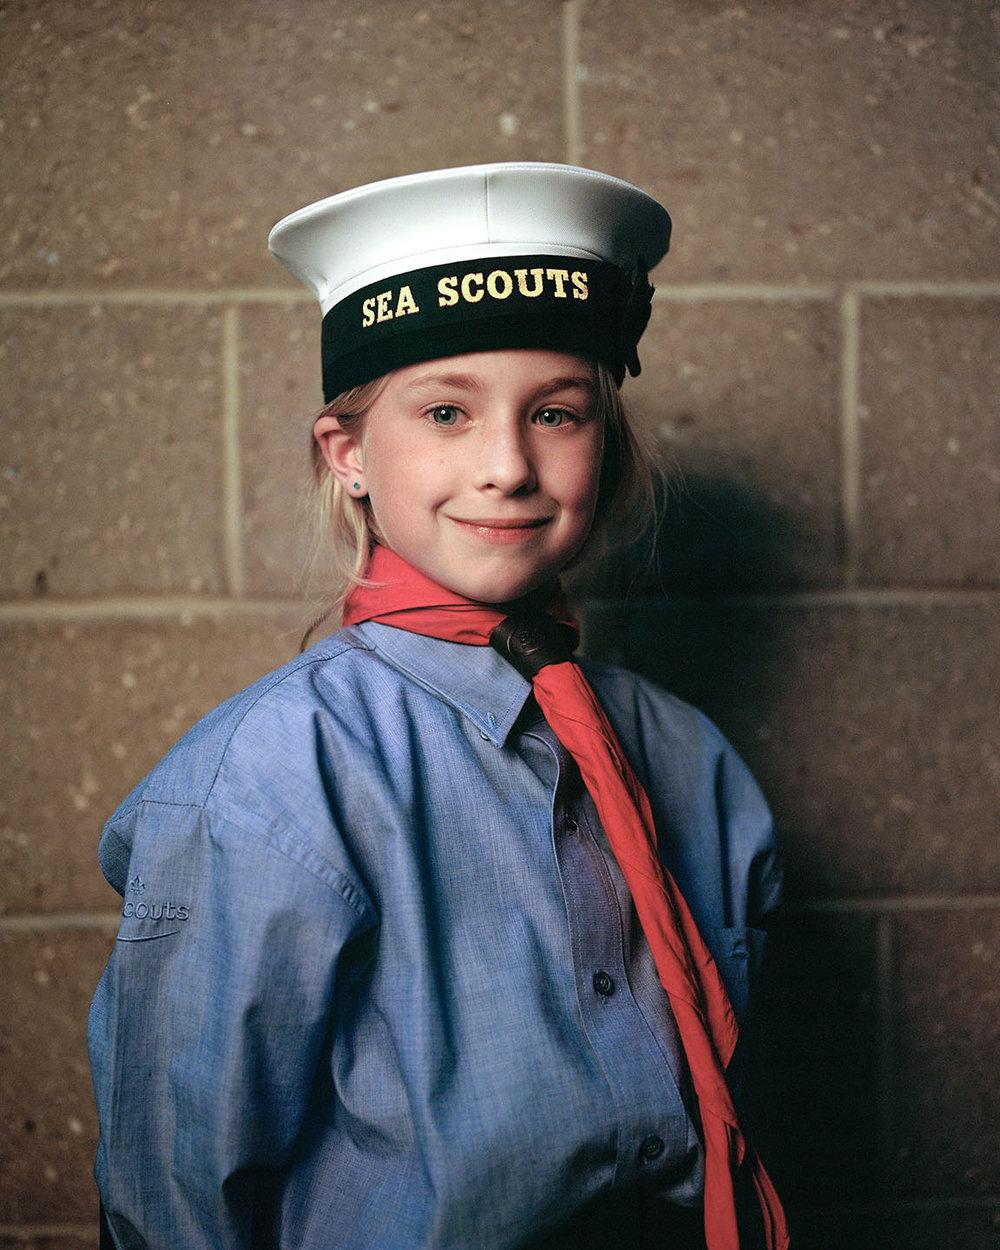 Untitled I. Sea Scout. England. Izzy de Wattripont.jpg